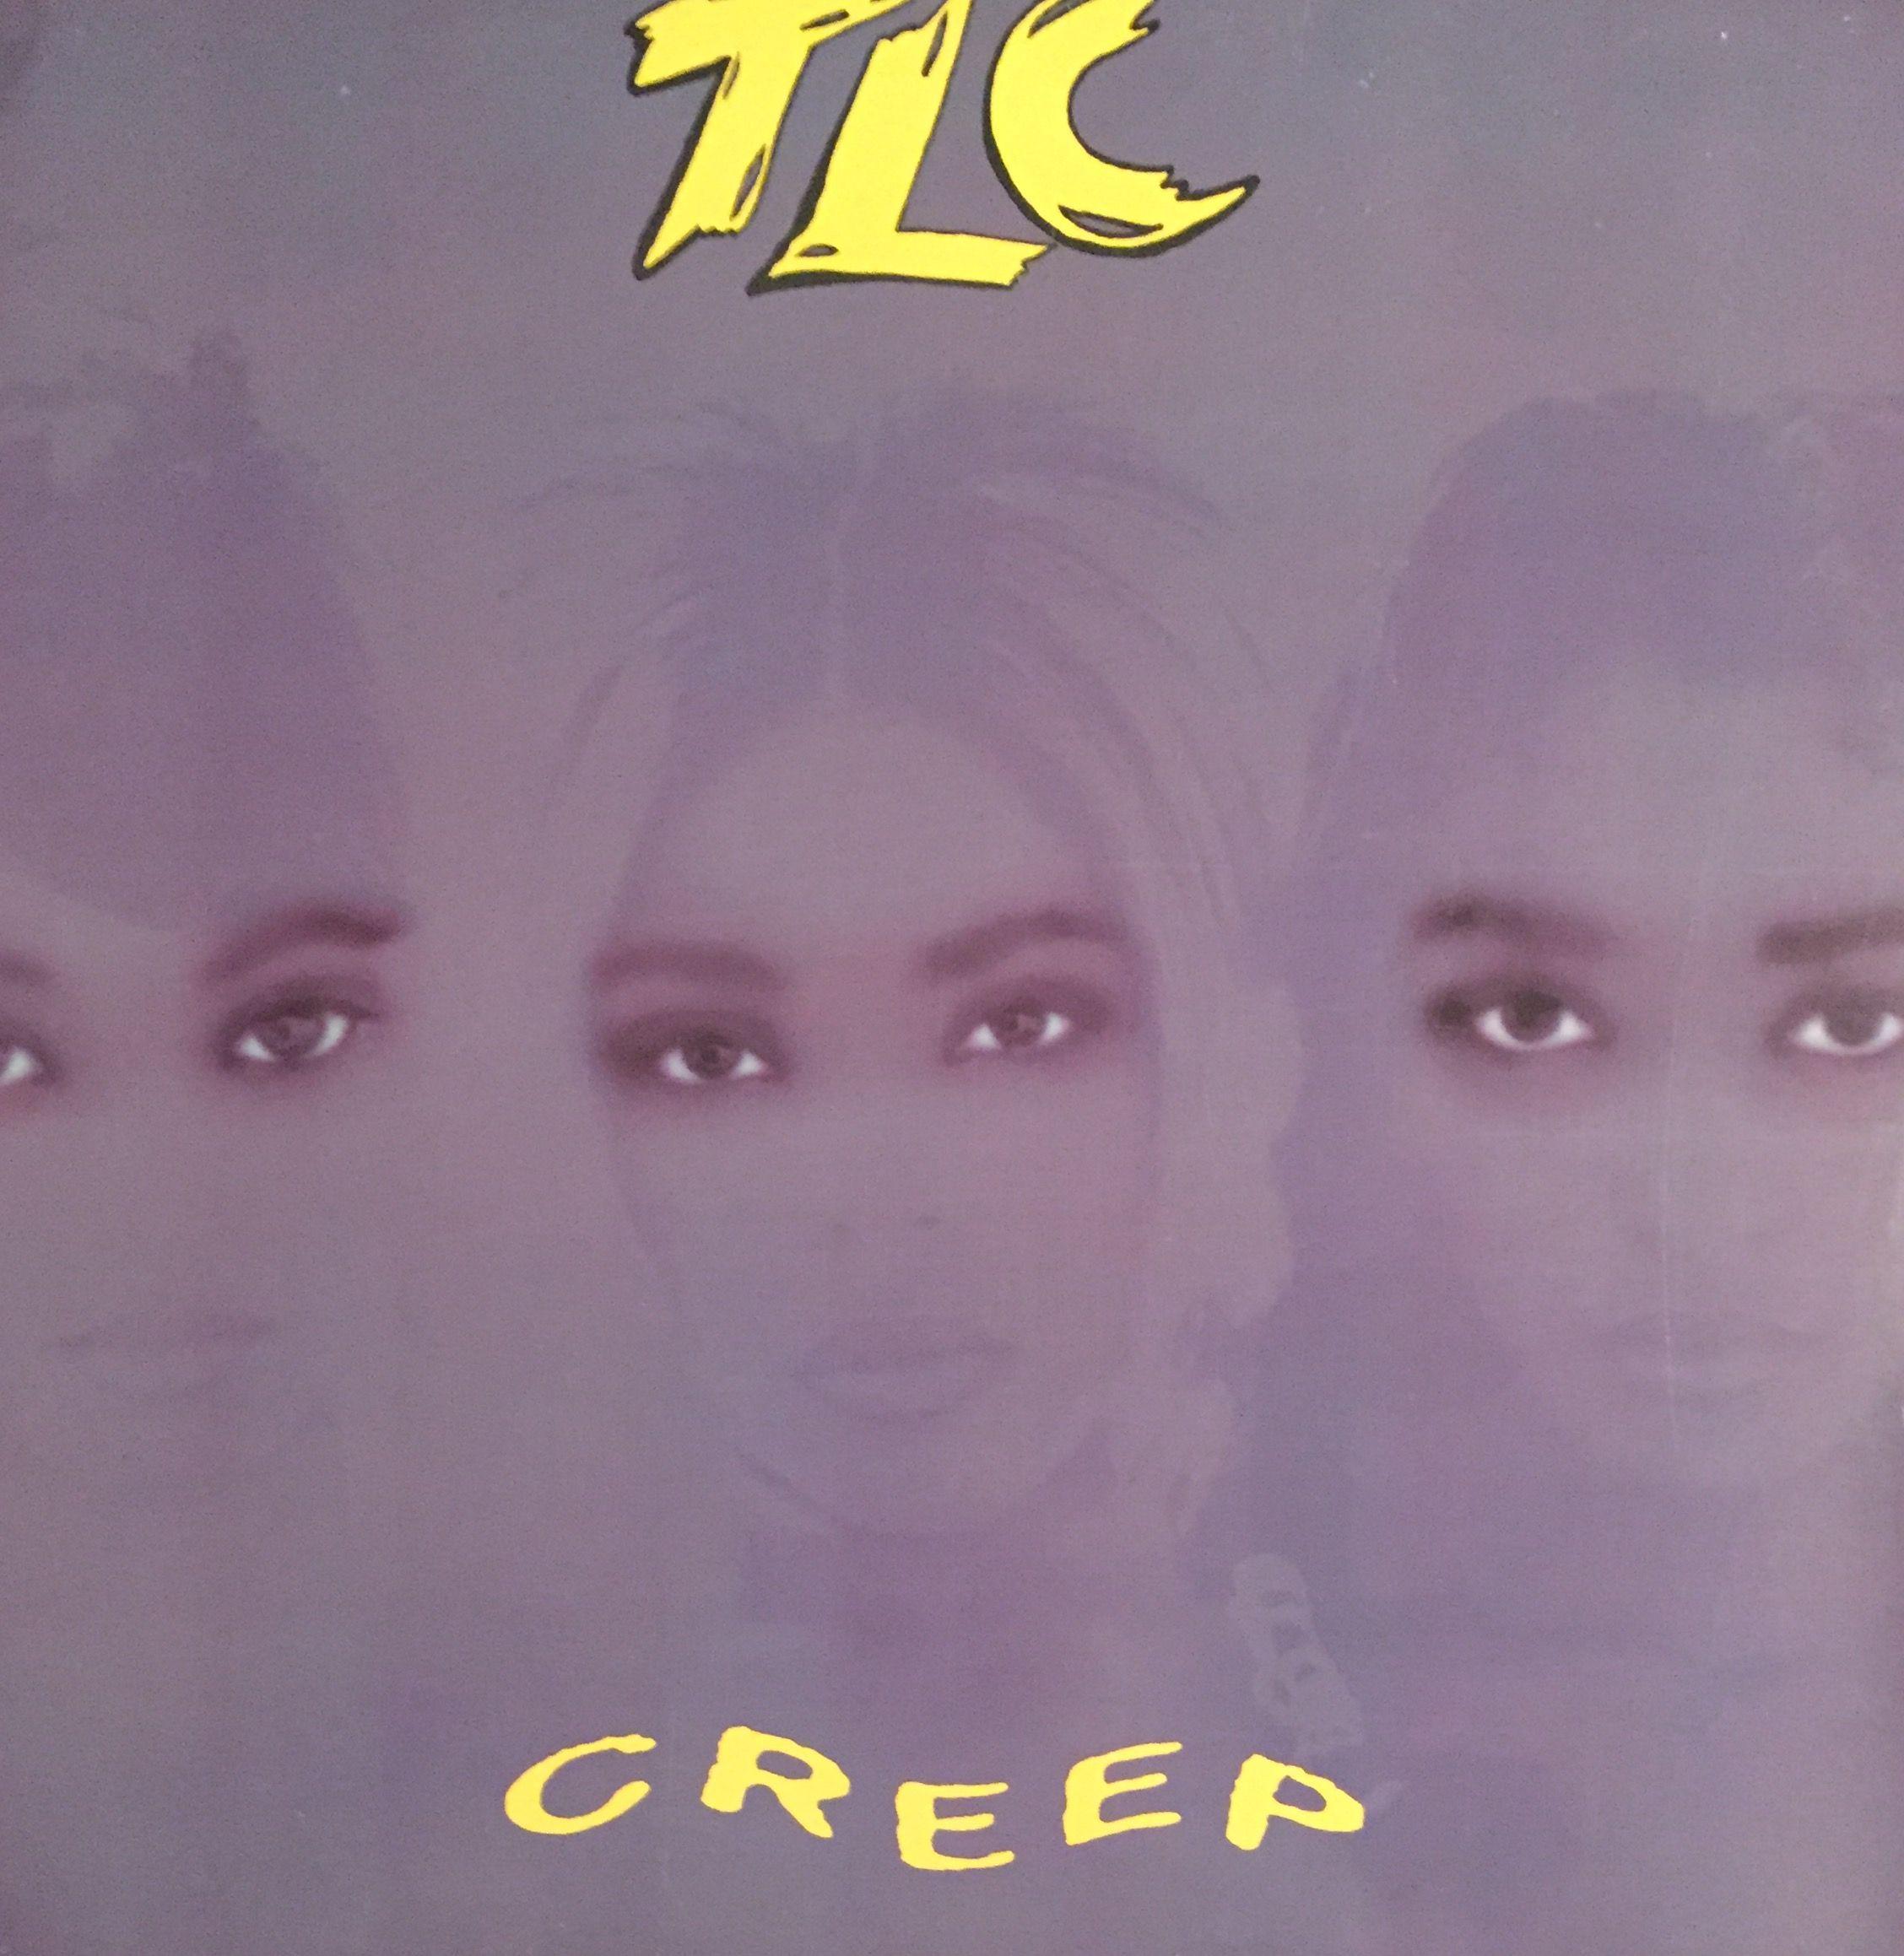 TLC - 'Creep' 1994 #90s R&B 12-inch remix #vinylrecords. RIP Lisa 'Left Eye' Lopez. #TLC #hiphop #music.  The best...